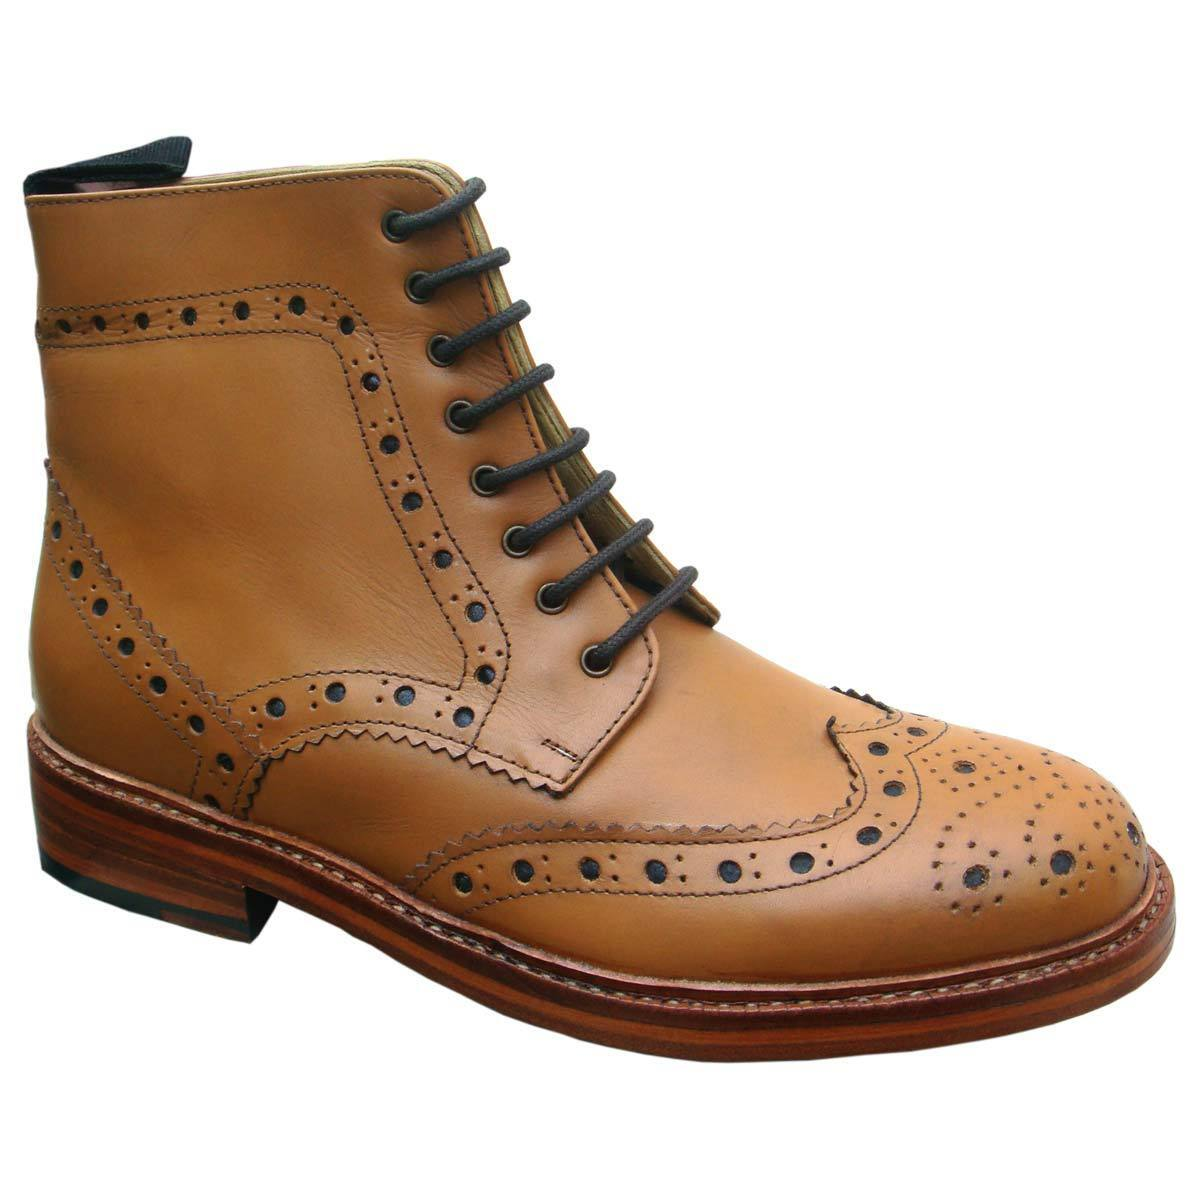 KINGKOMFORT GRAND (KK107LS) HANDMADE GOODYEAR WELTED 100% REAL LEATHER Stiefel